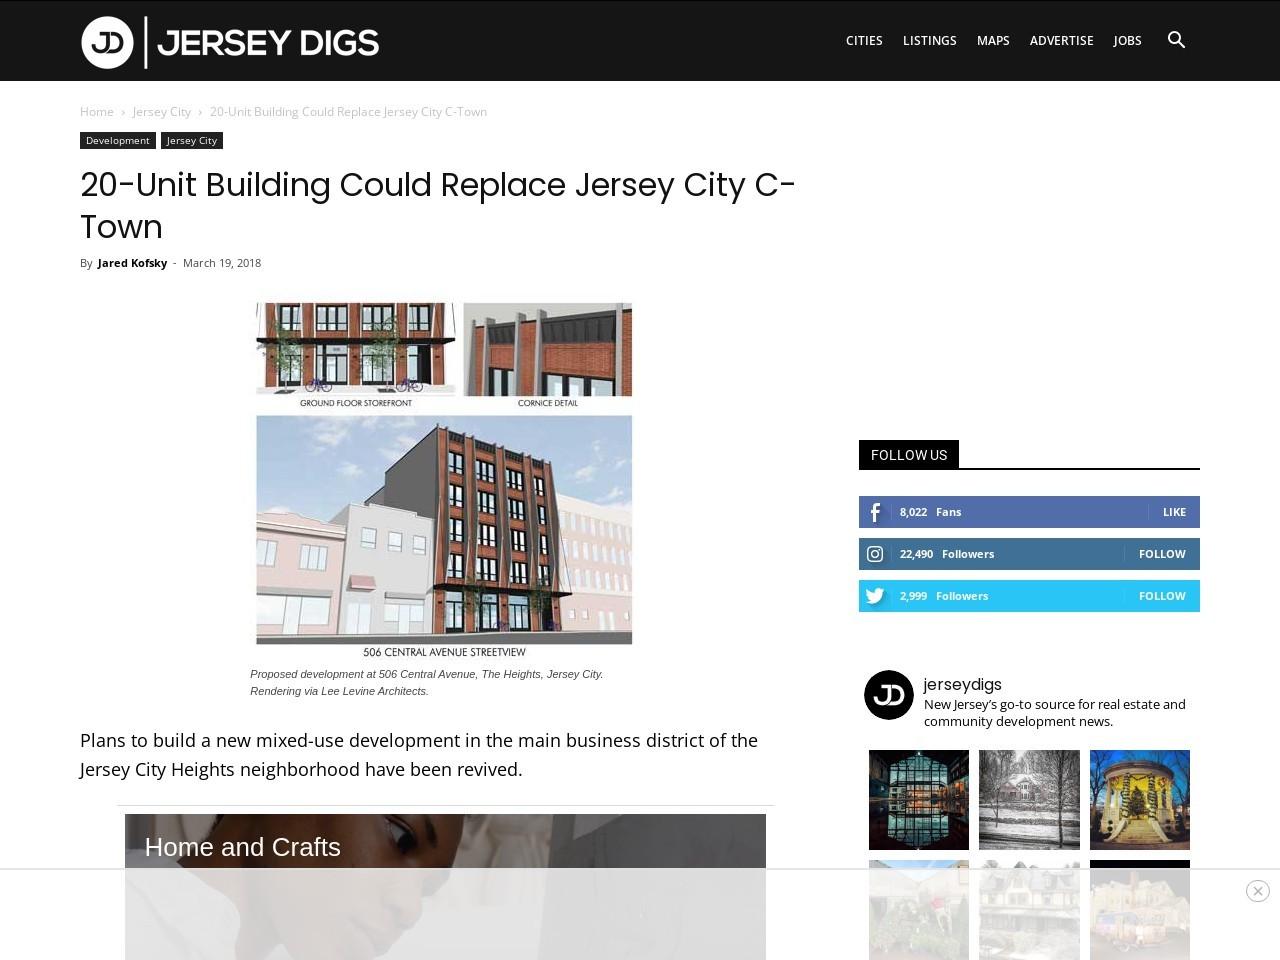 20-Unit Building Could Replace Jersey City C-Town